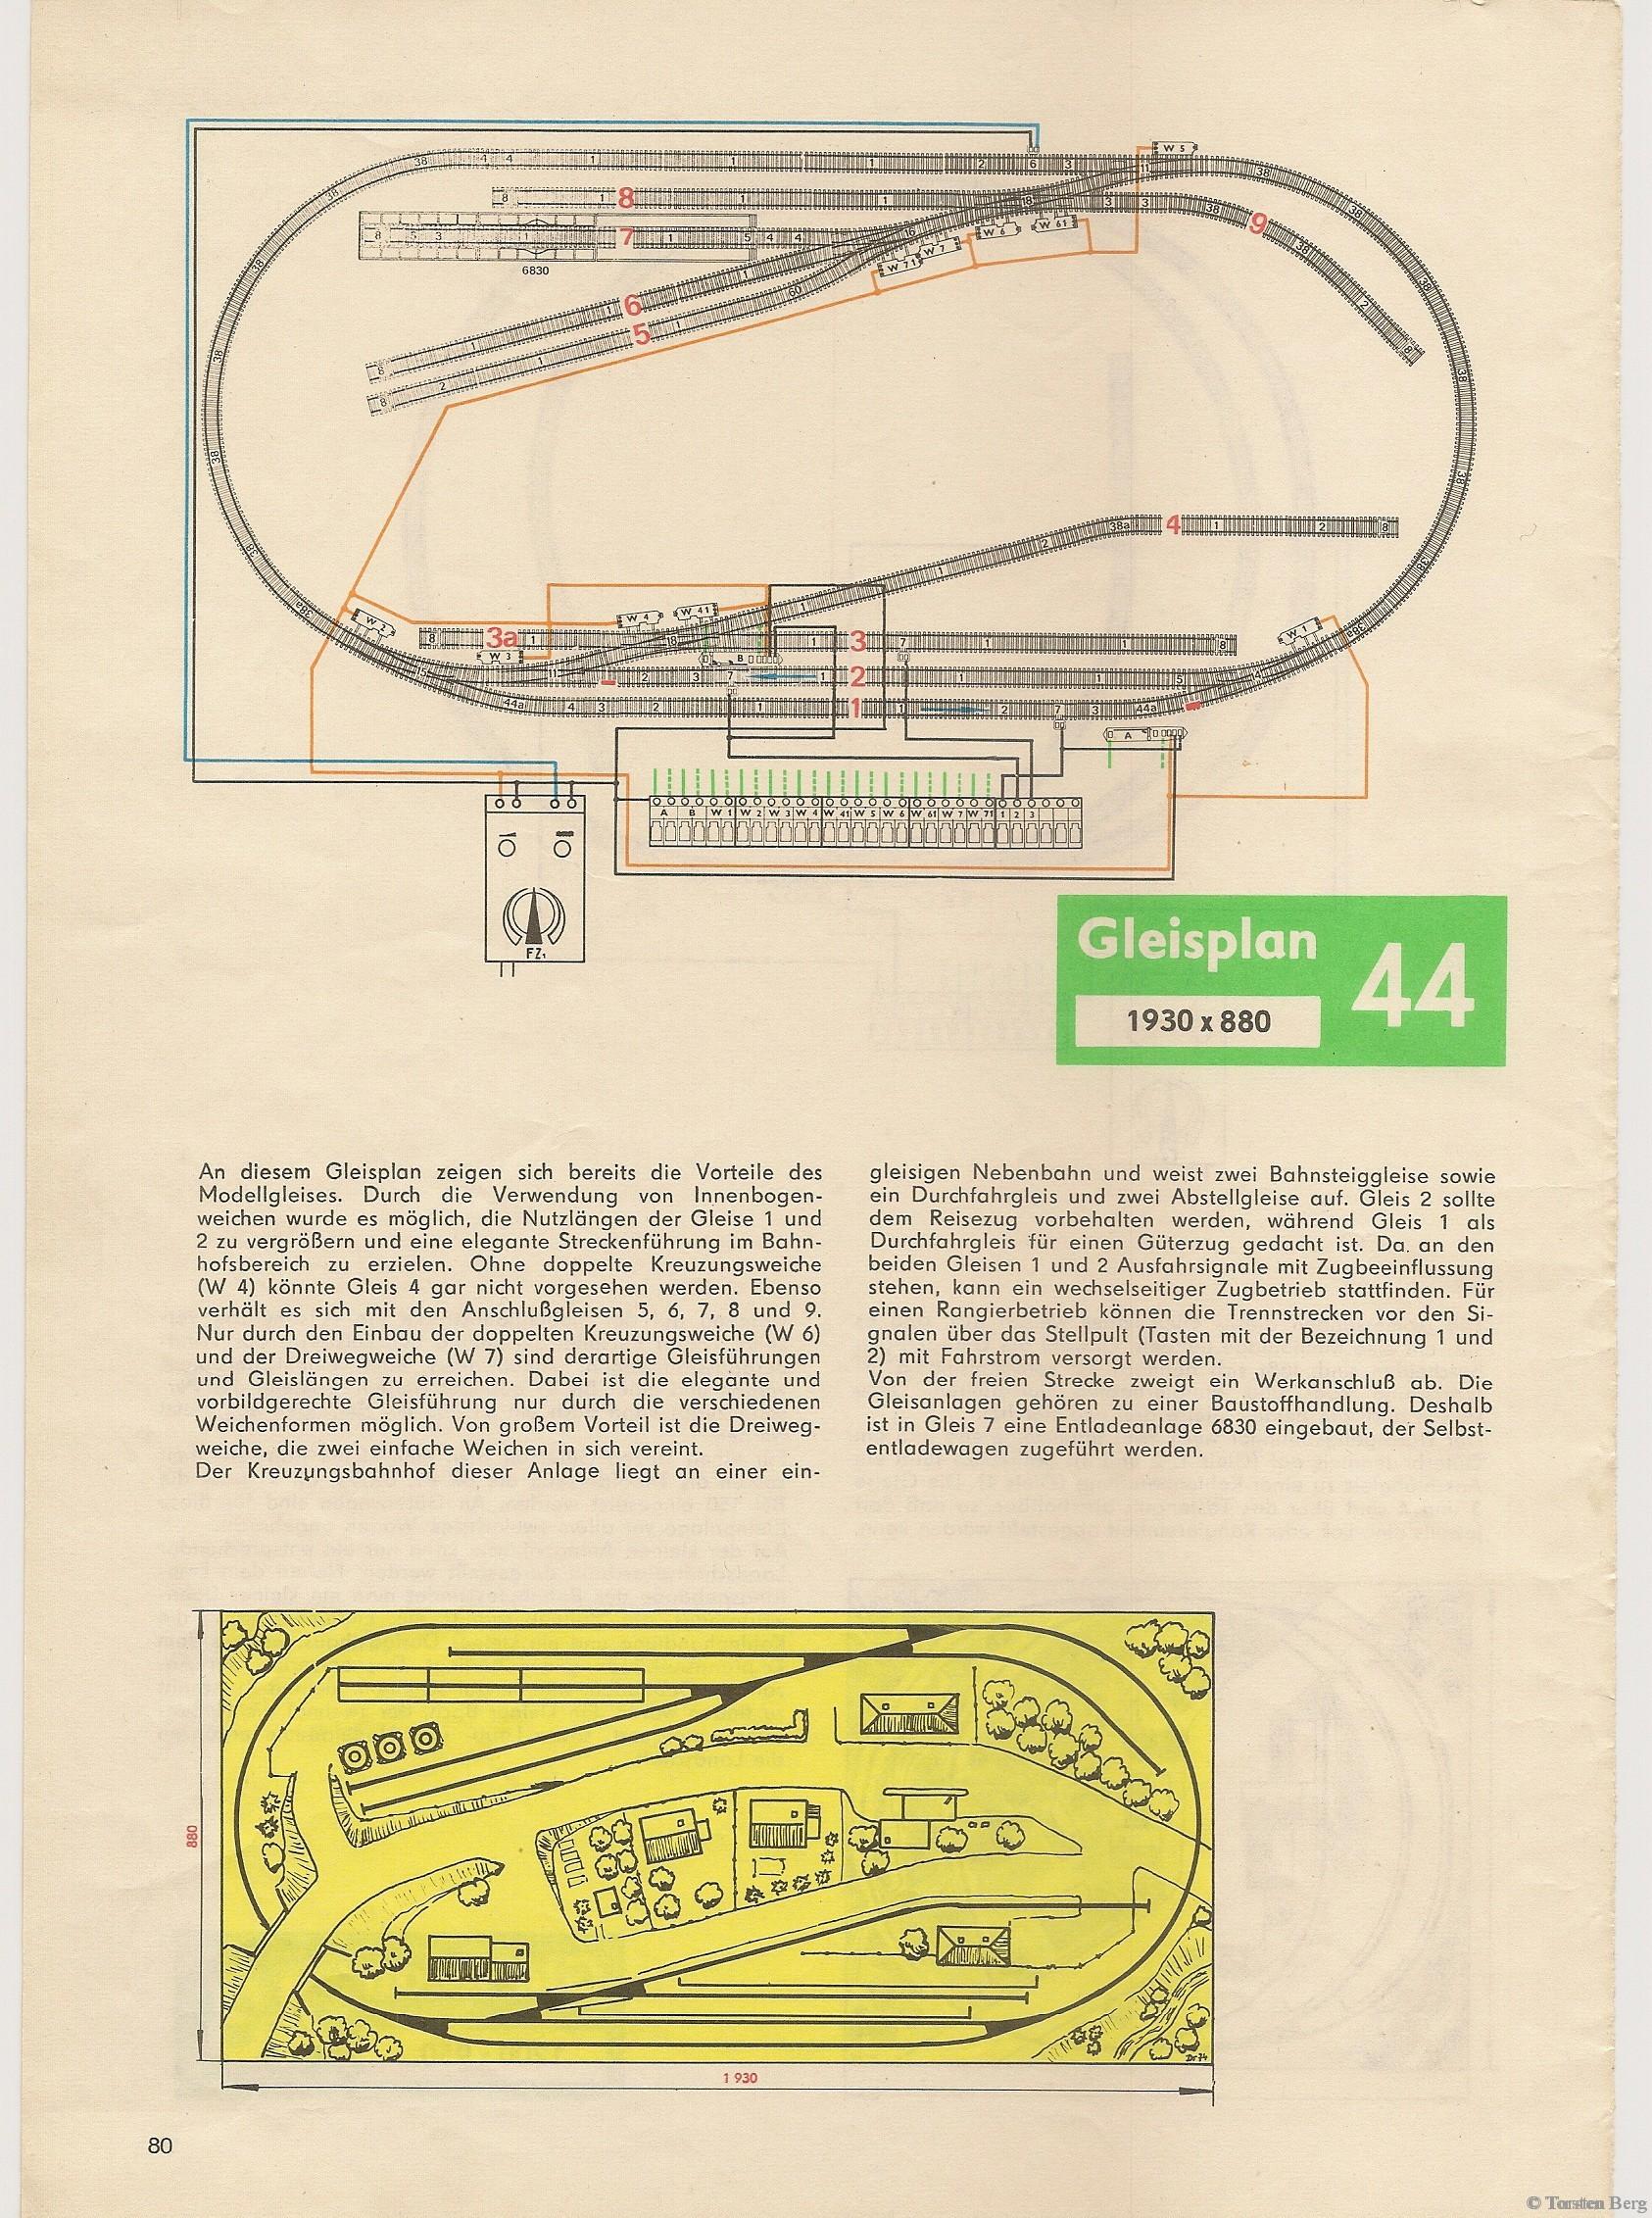 81 VEB Kombinat PIKO Standardgleis-Gleisplan 44